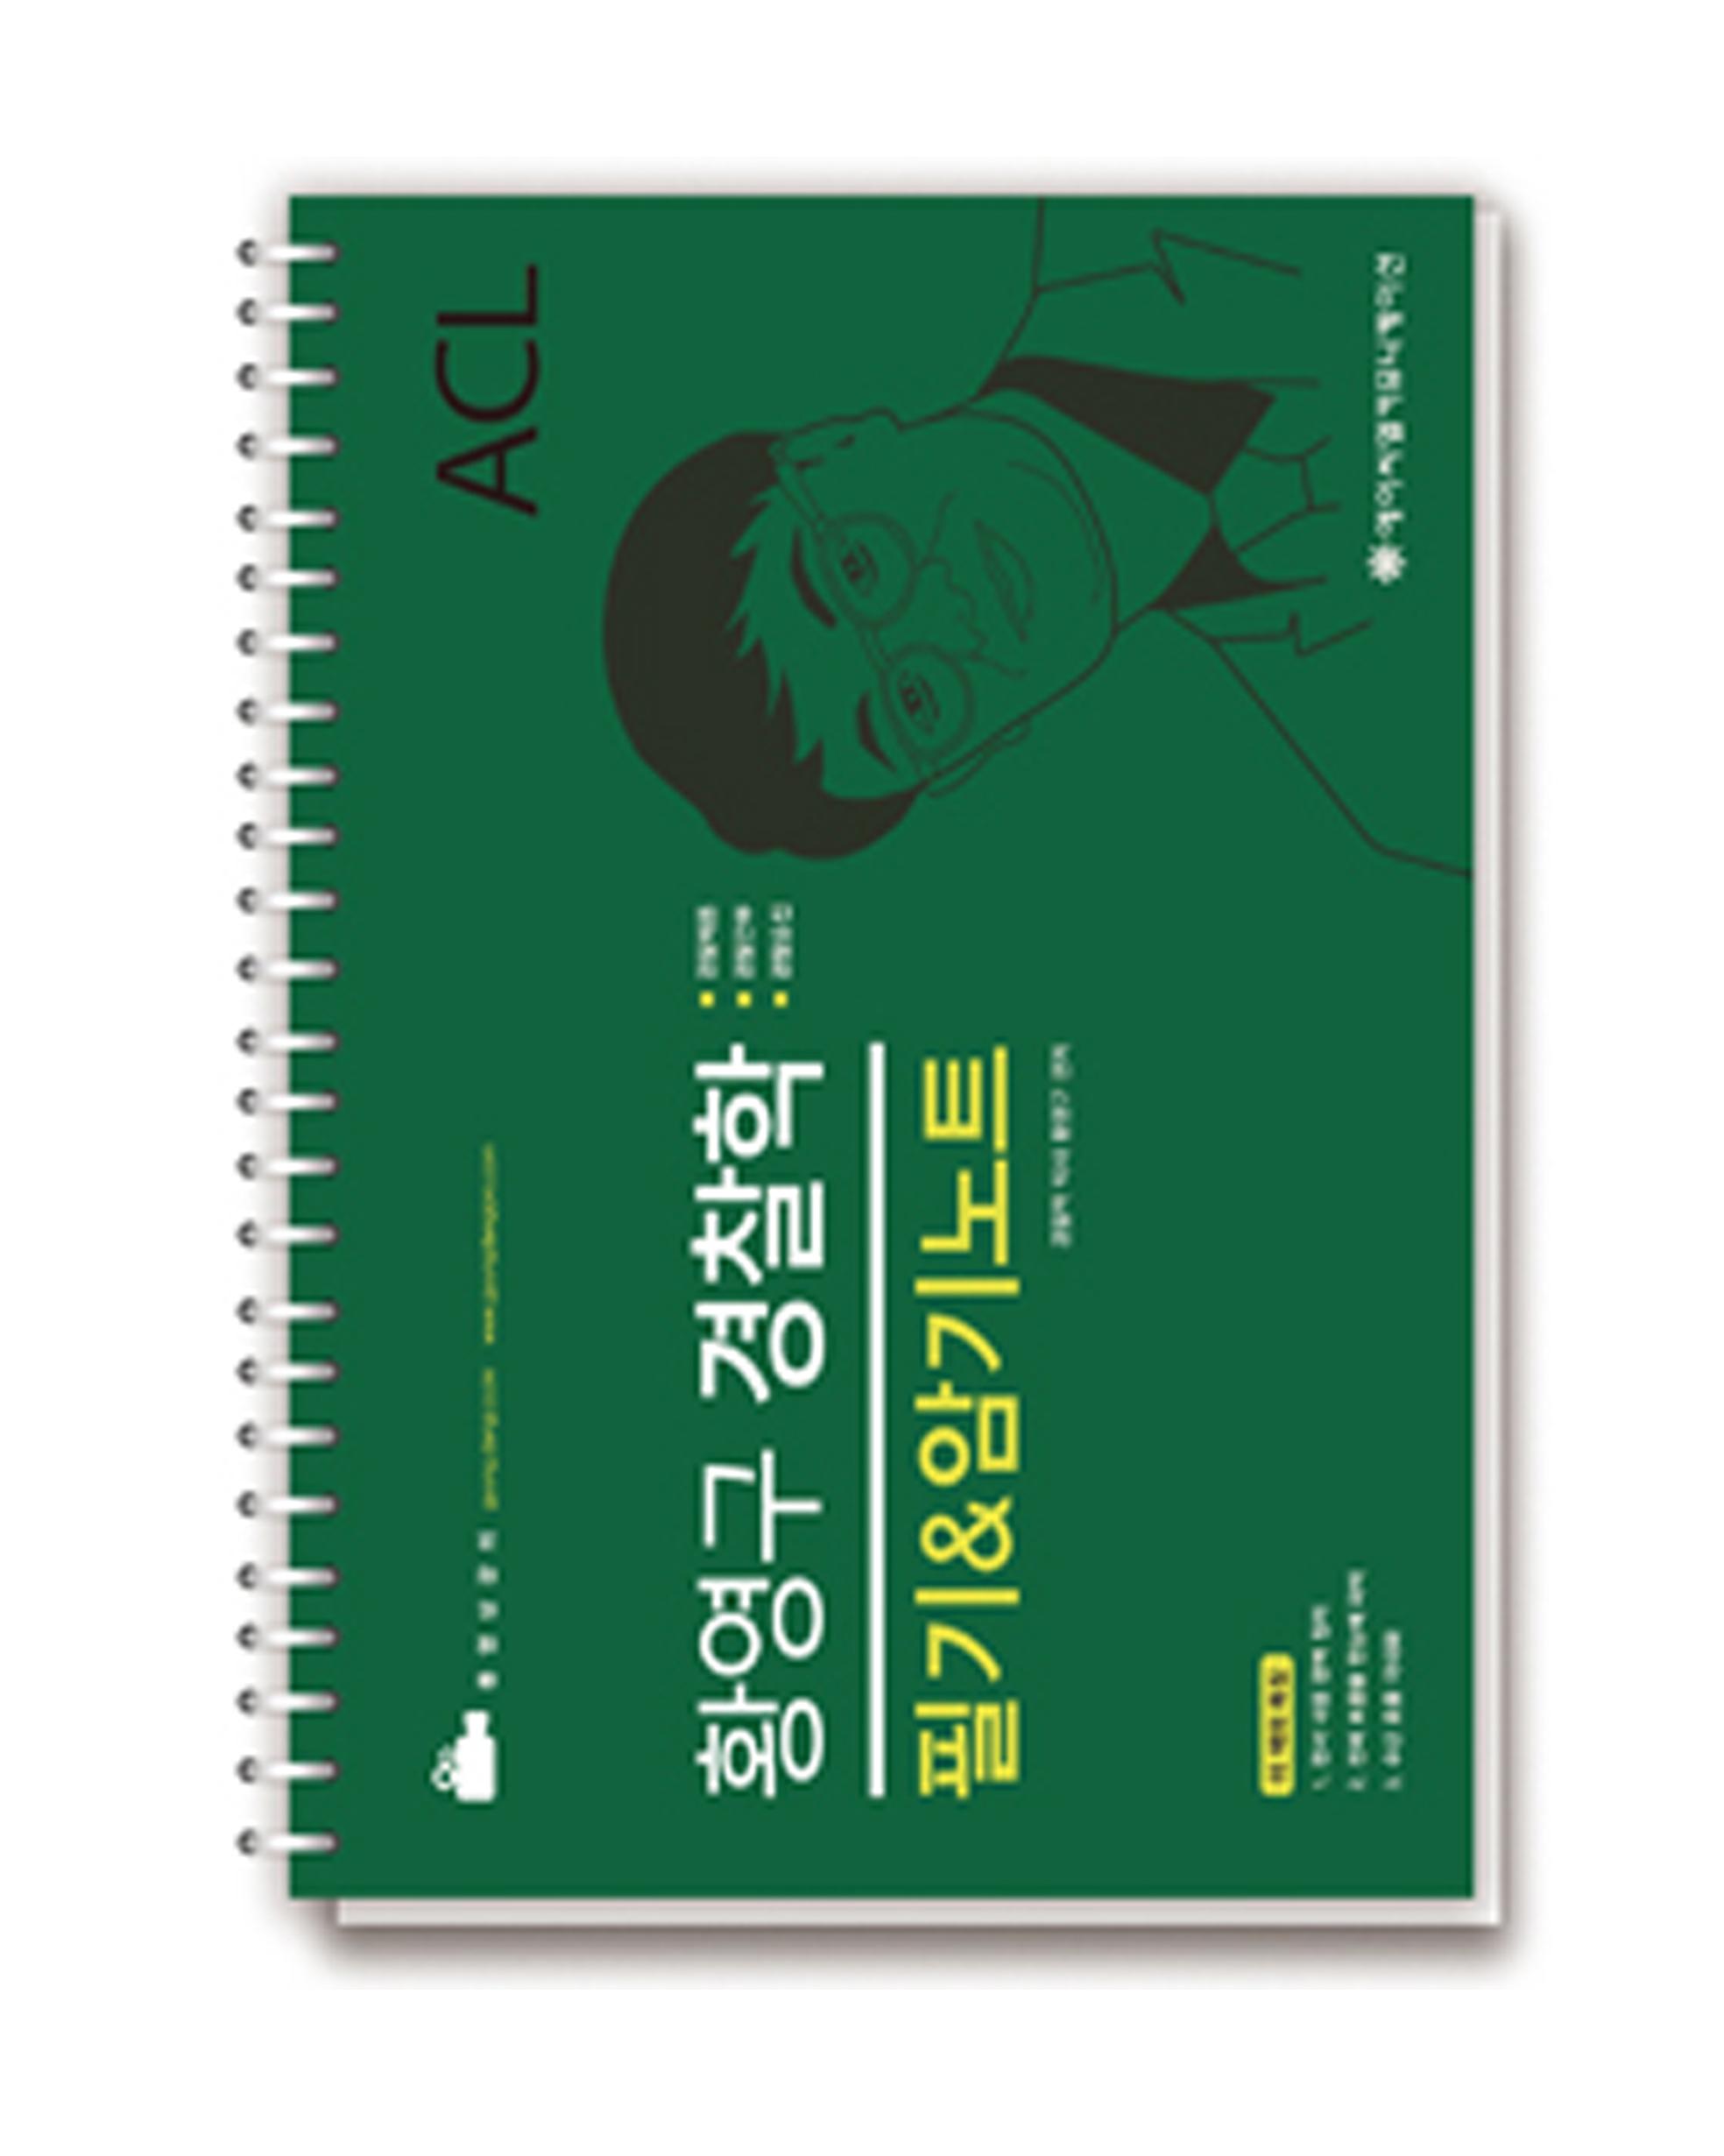 2017 ACL 황영구 경찰학 필기&암기노트(일시 품절)